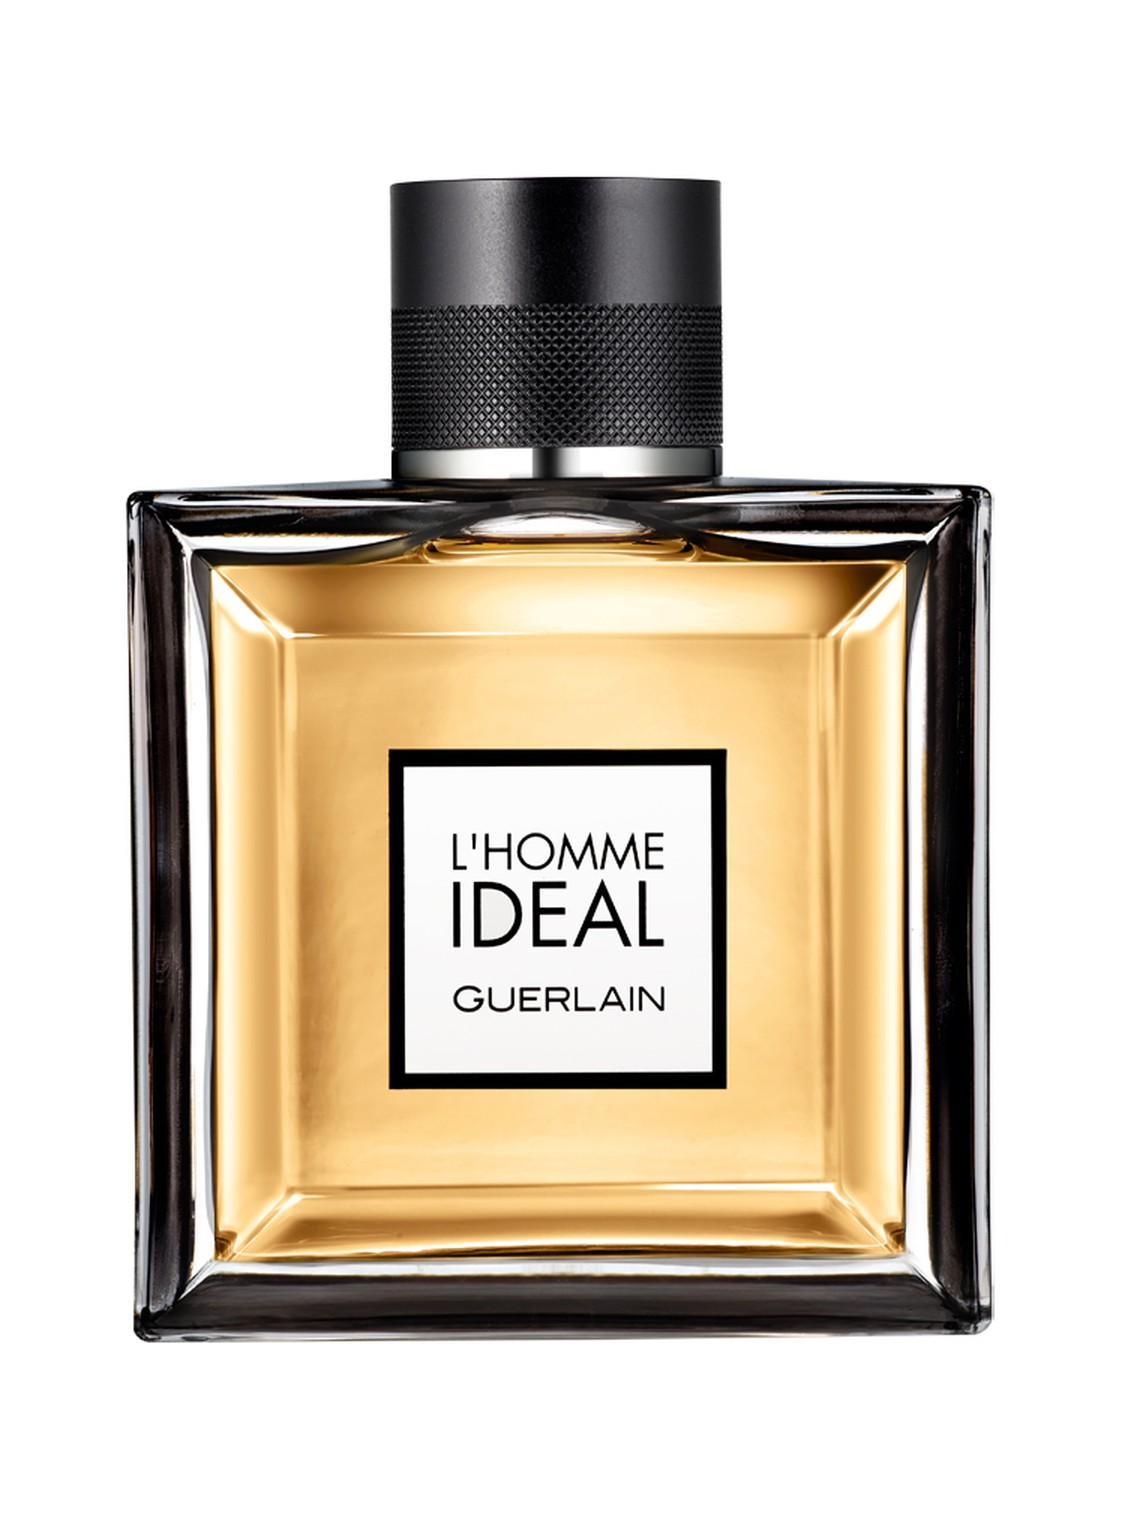 Guerlain L'Homme Idéal аромат для мужчин